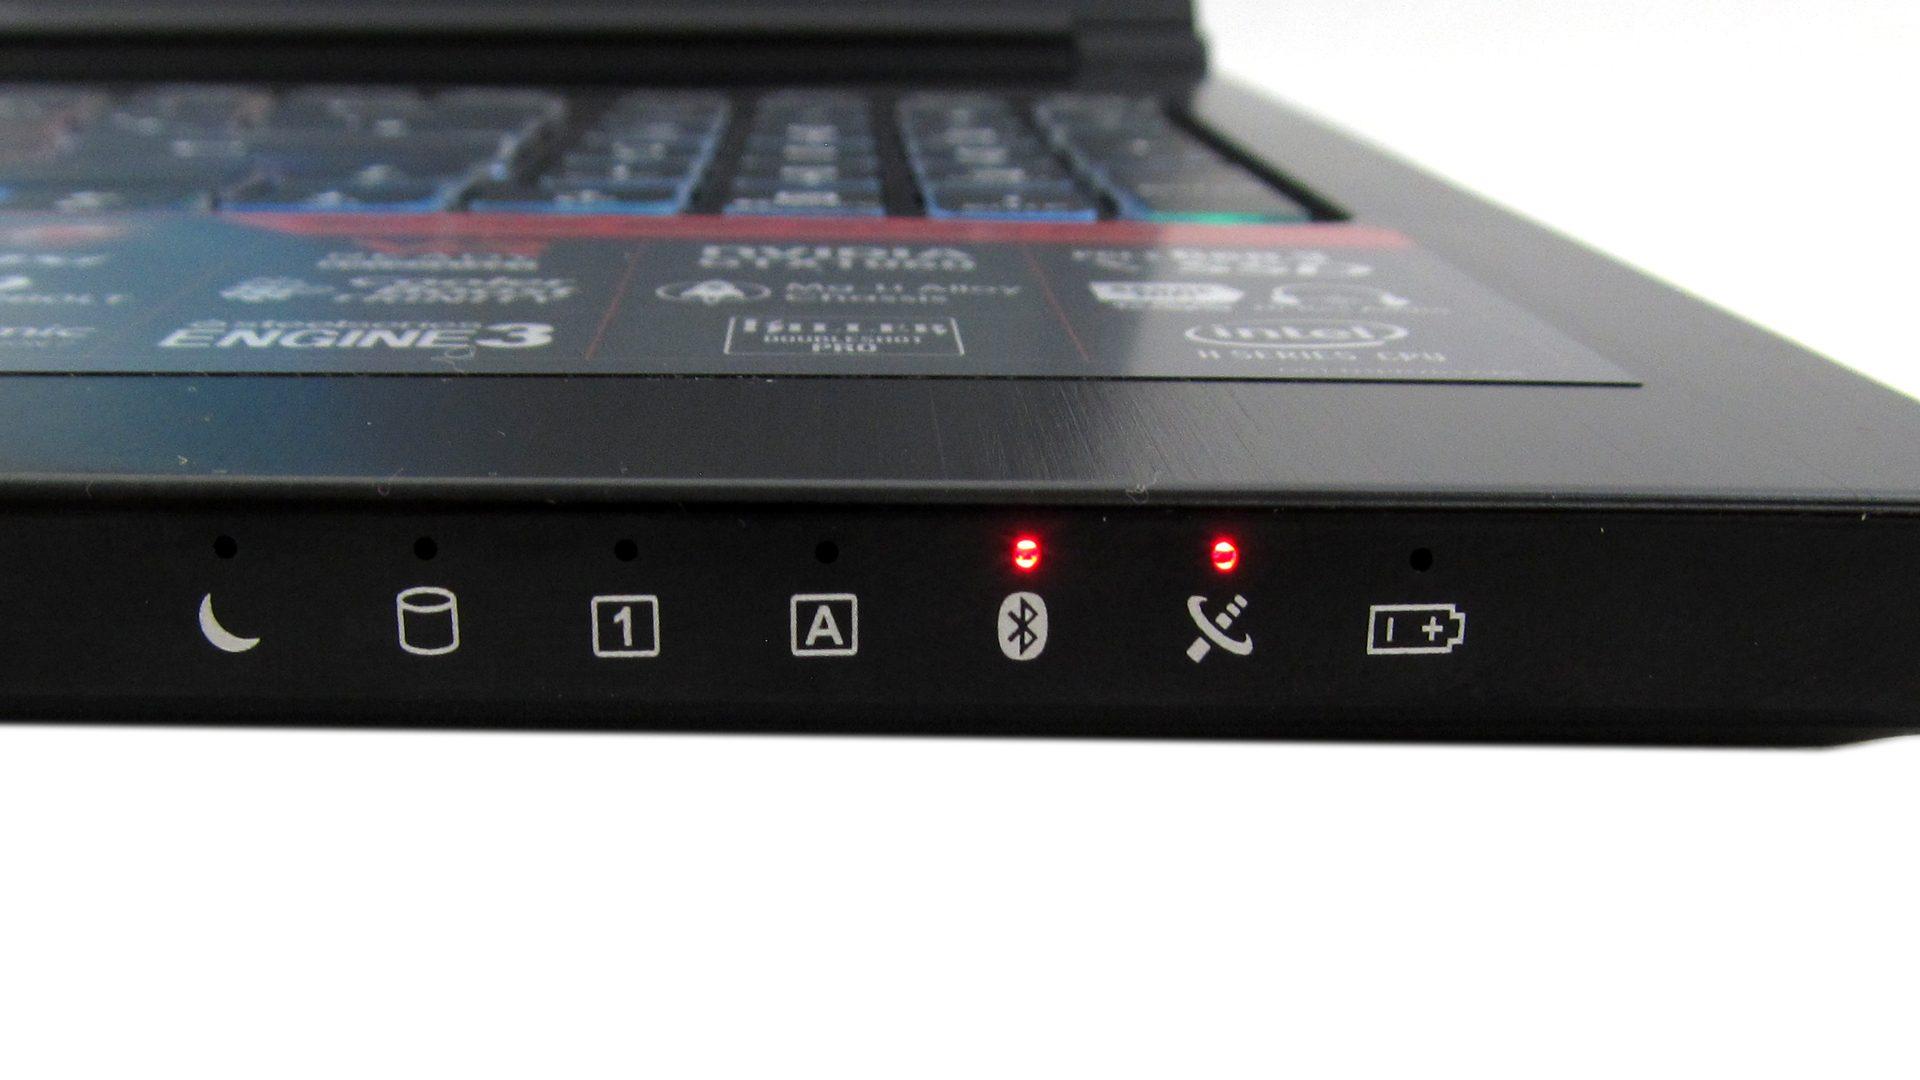 msi_gs63vr_tastatur_3